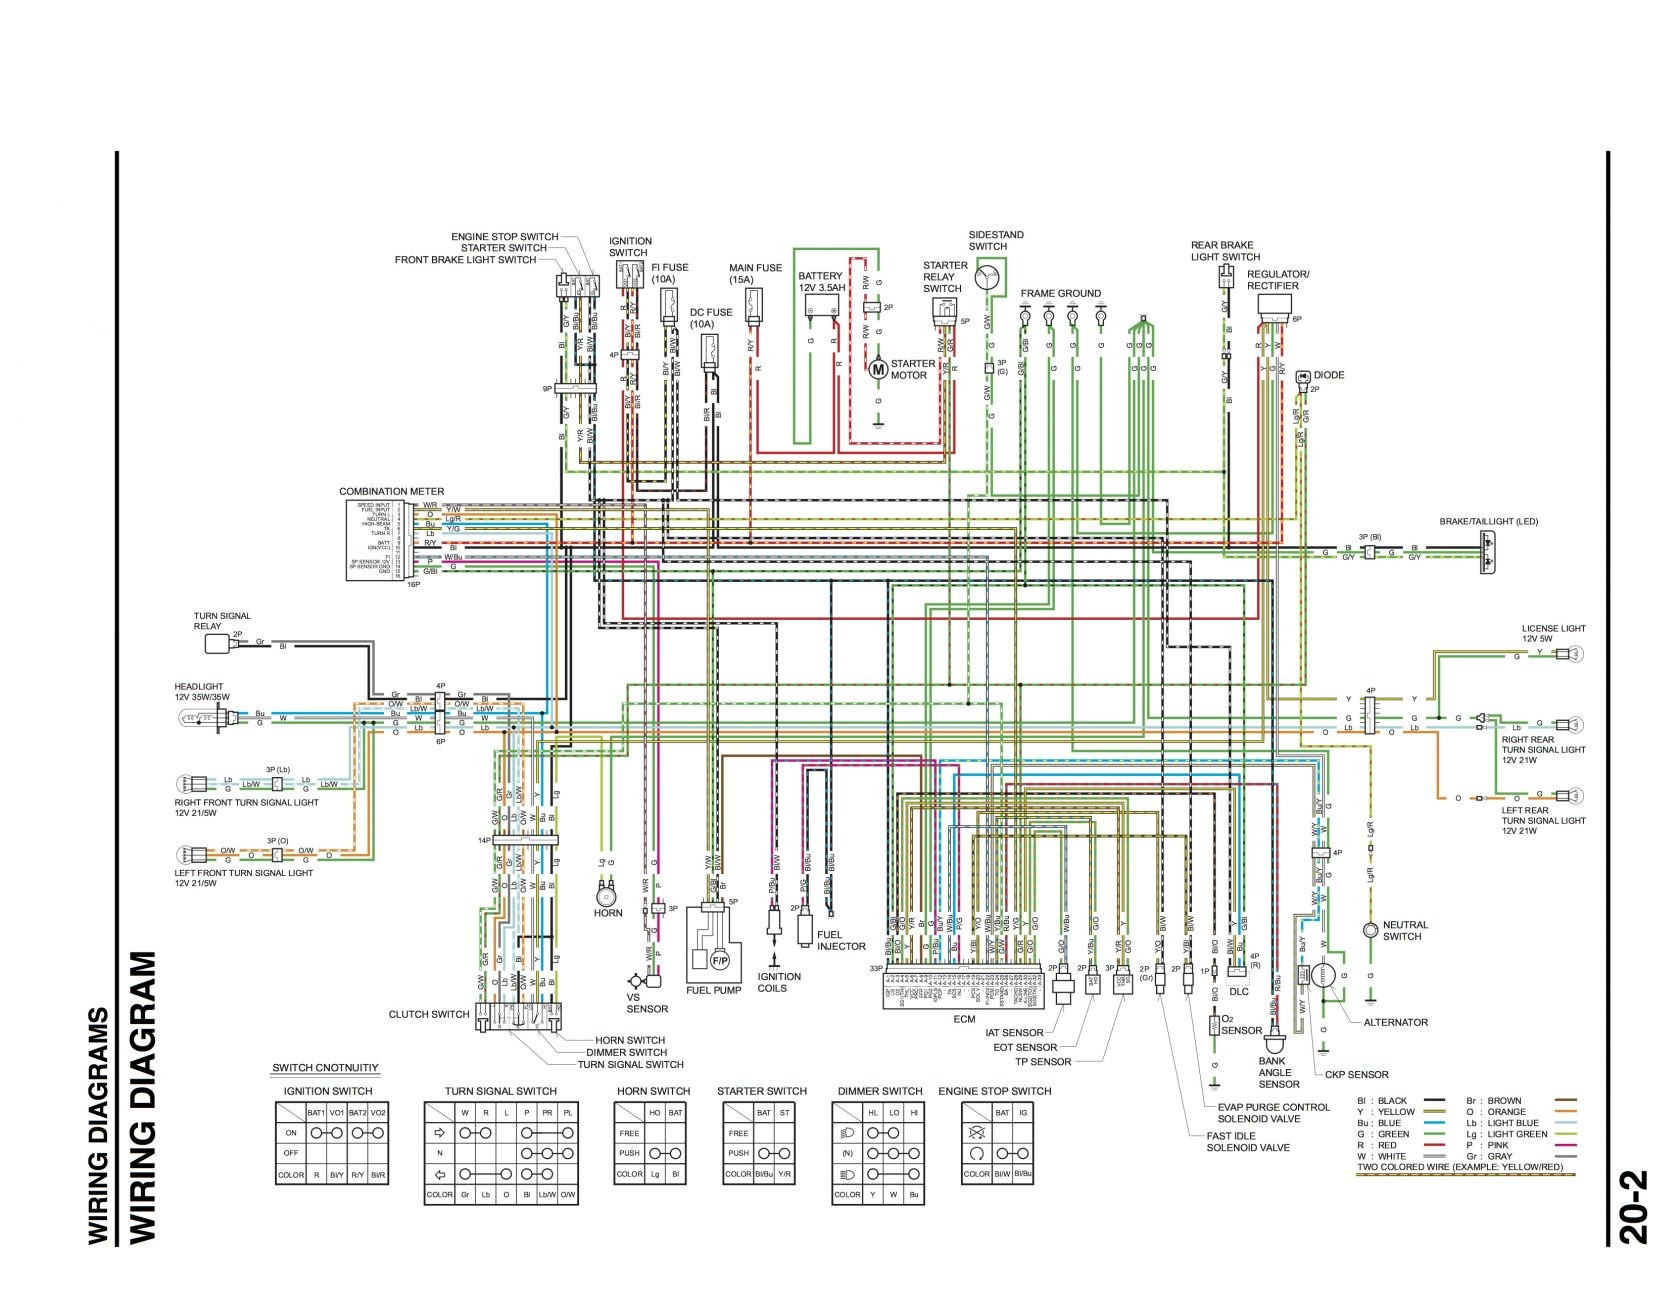 Modern 377 Peterbilt Wiring Diagram Gift - Simple Wiring Diagram ...